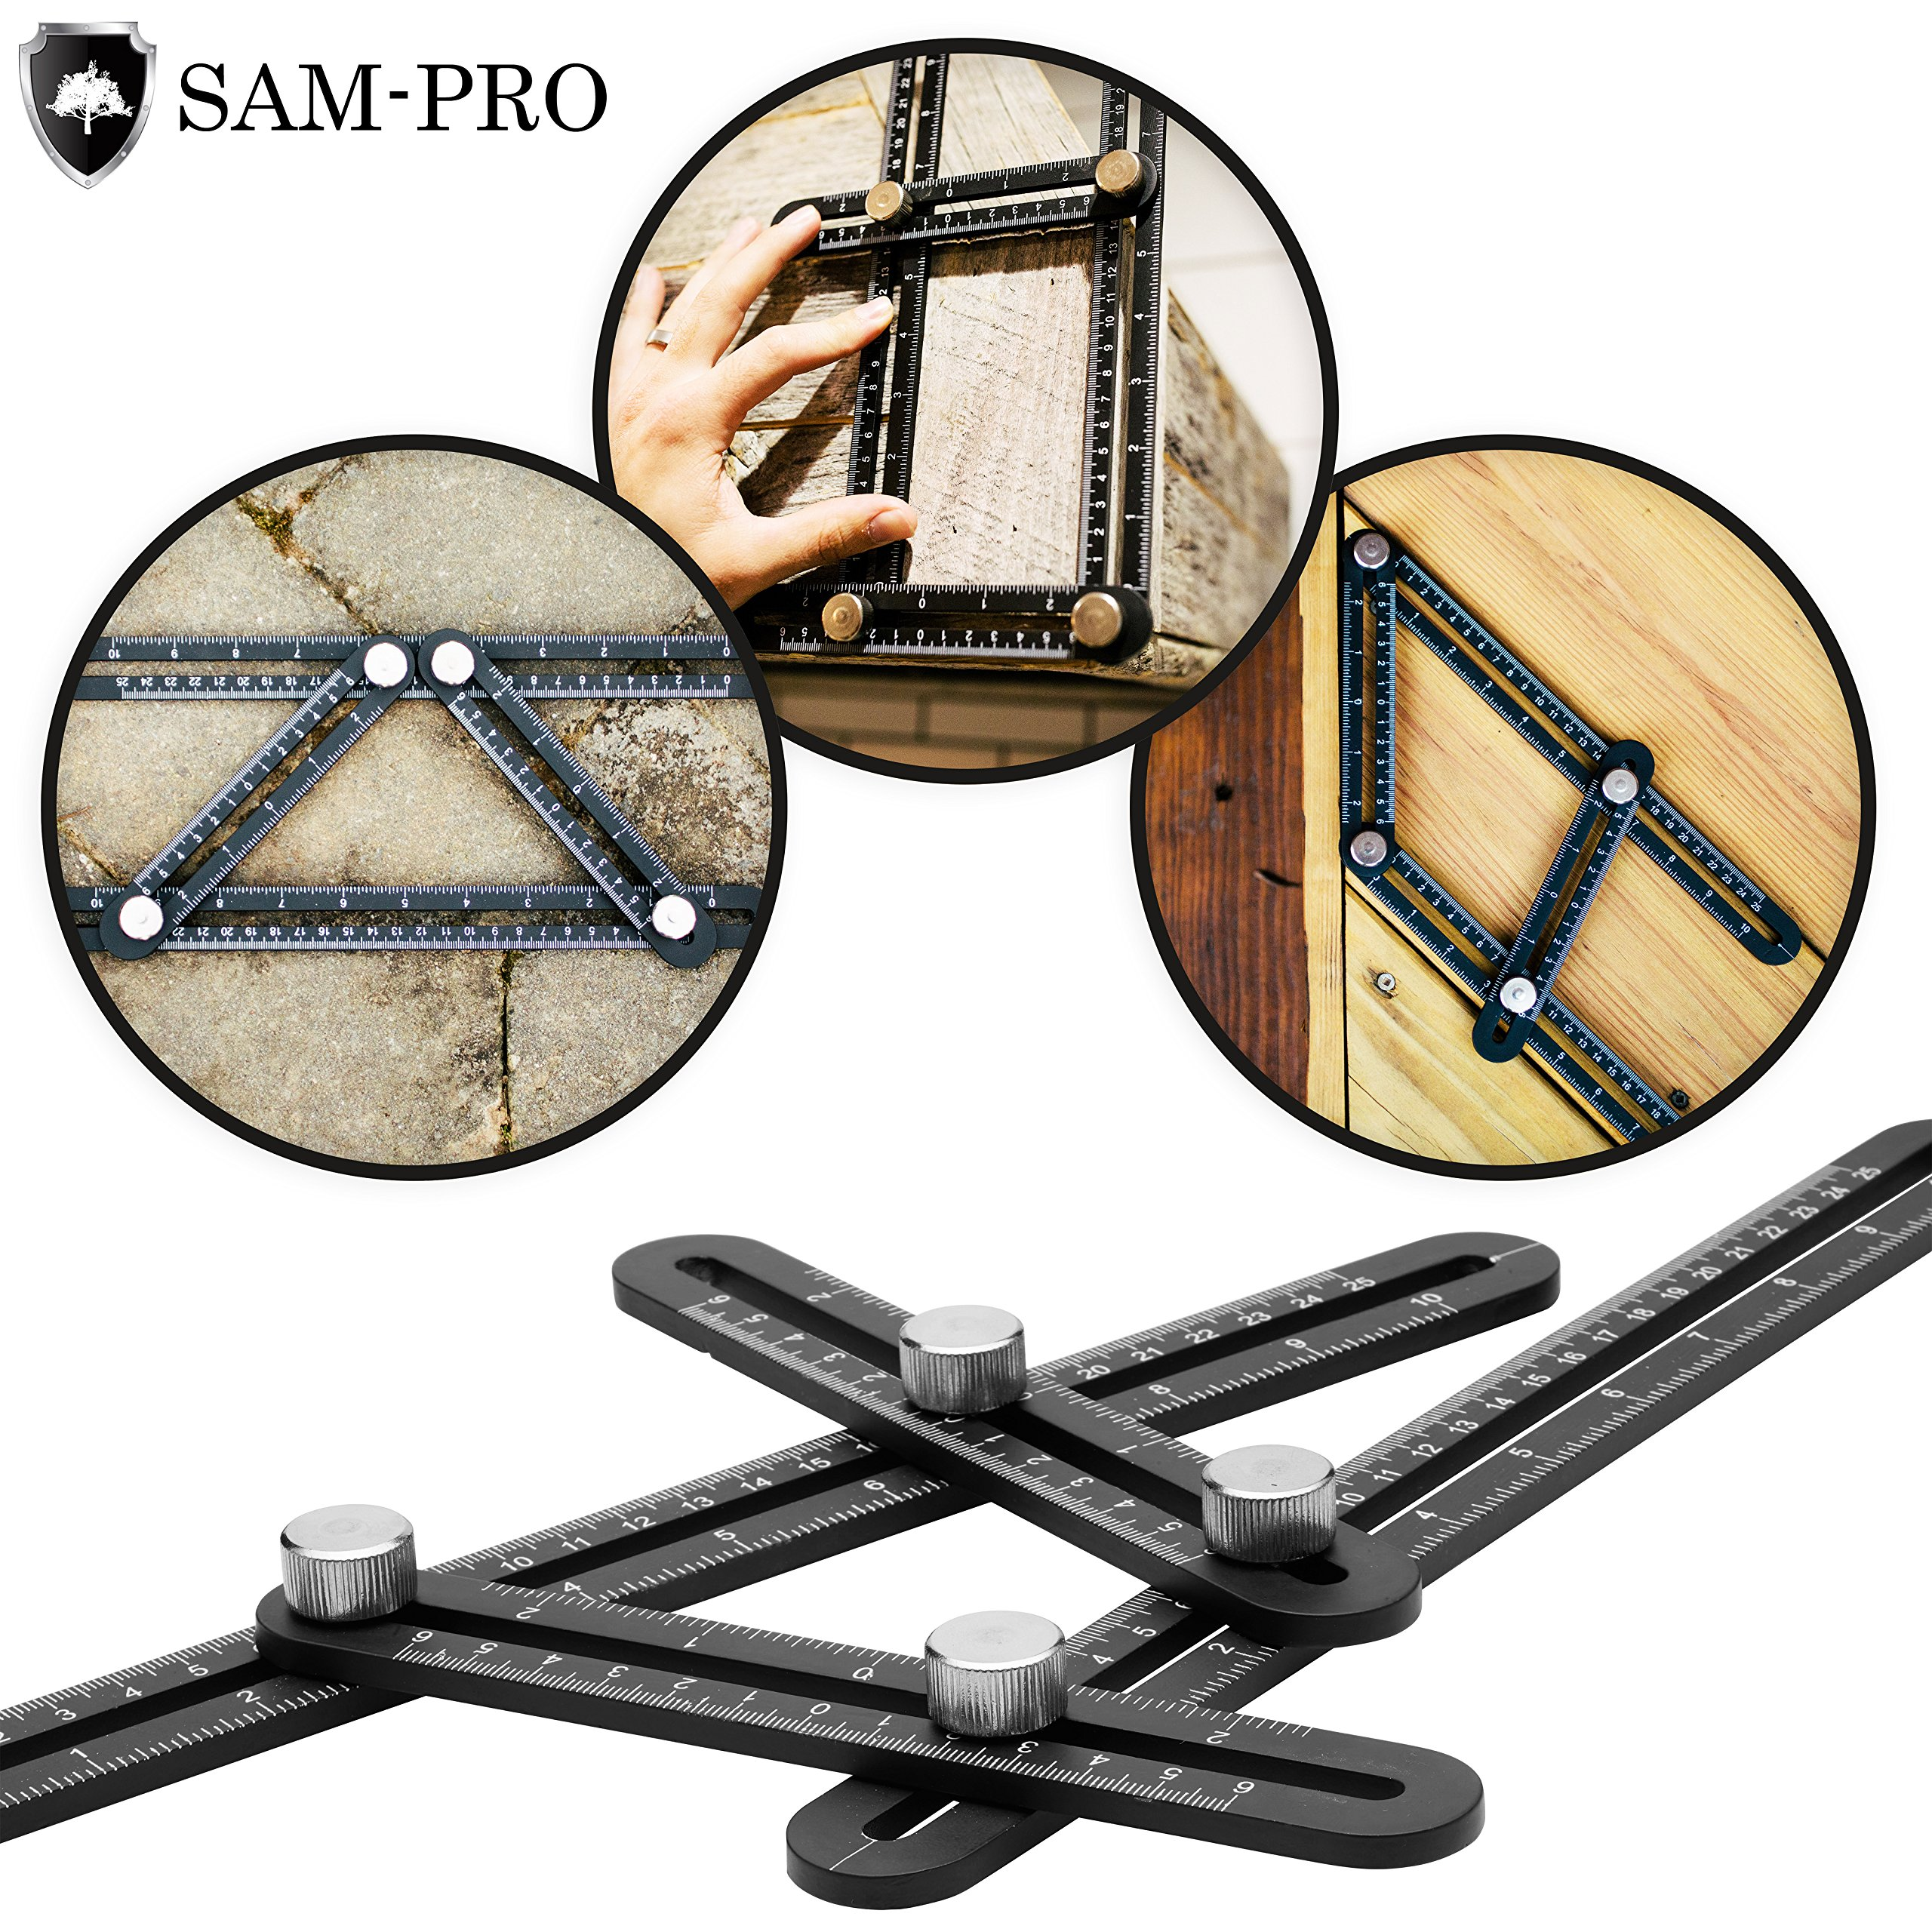 Template Angle Tool-set: All Metal Aluminum Alloy Angleizer. Multi Angle Universal Angularizer Ruler for Measuring & Design. Travel Case, 5 Carpenter Pencils, & Sharpener Included!